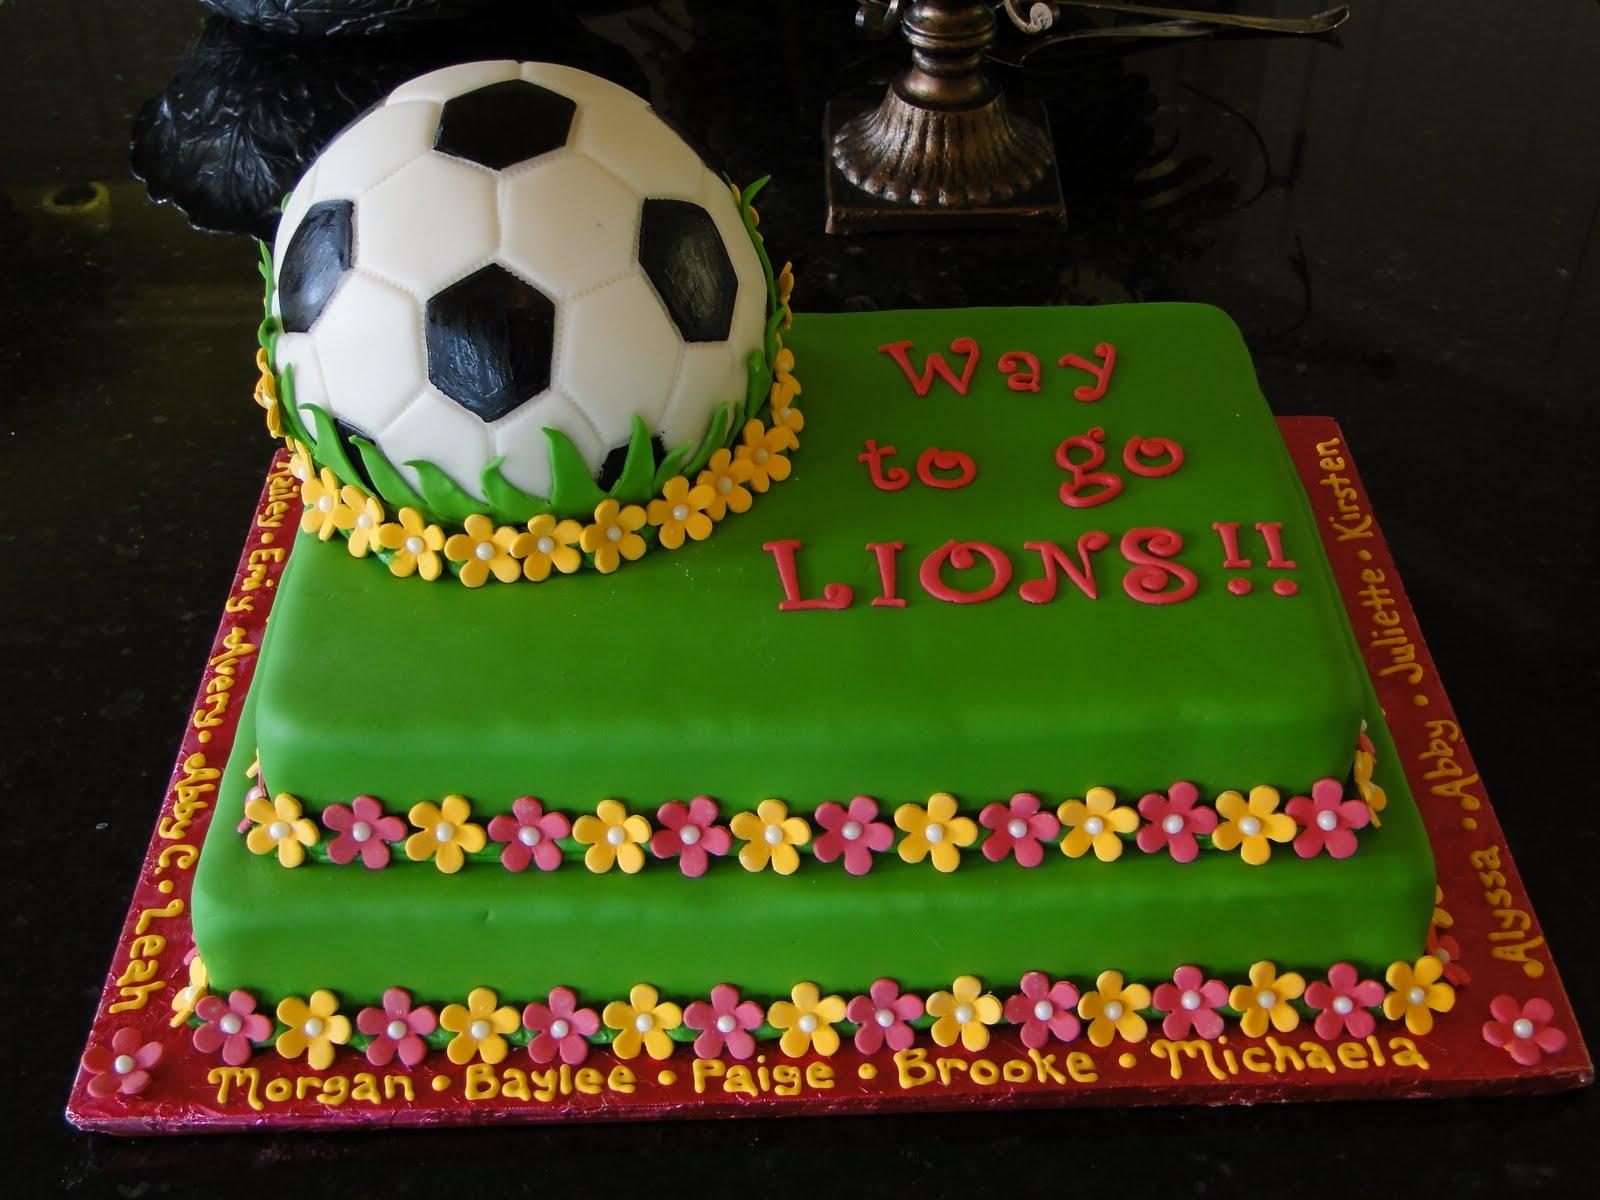 Images Of Soccer Cake : CakeByJess: Soccer Cake